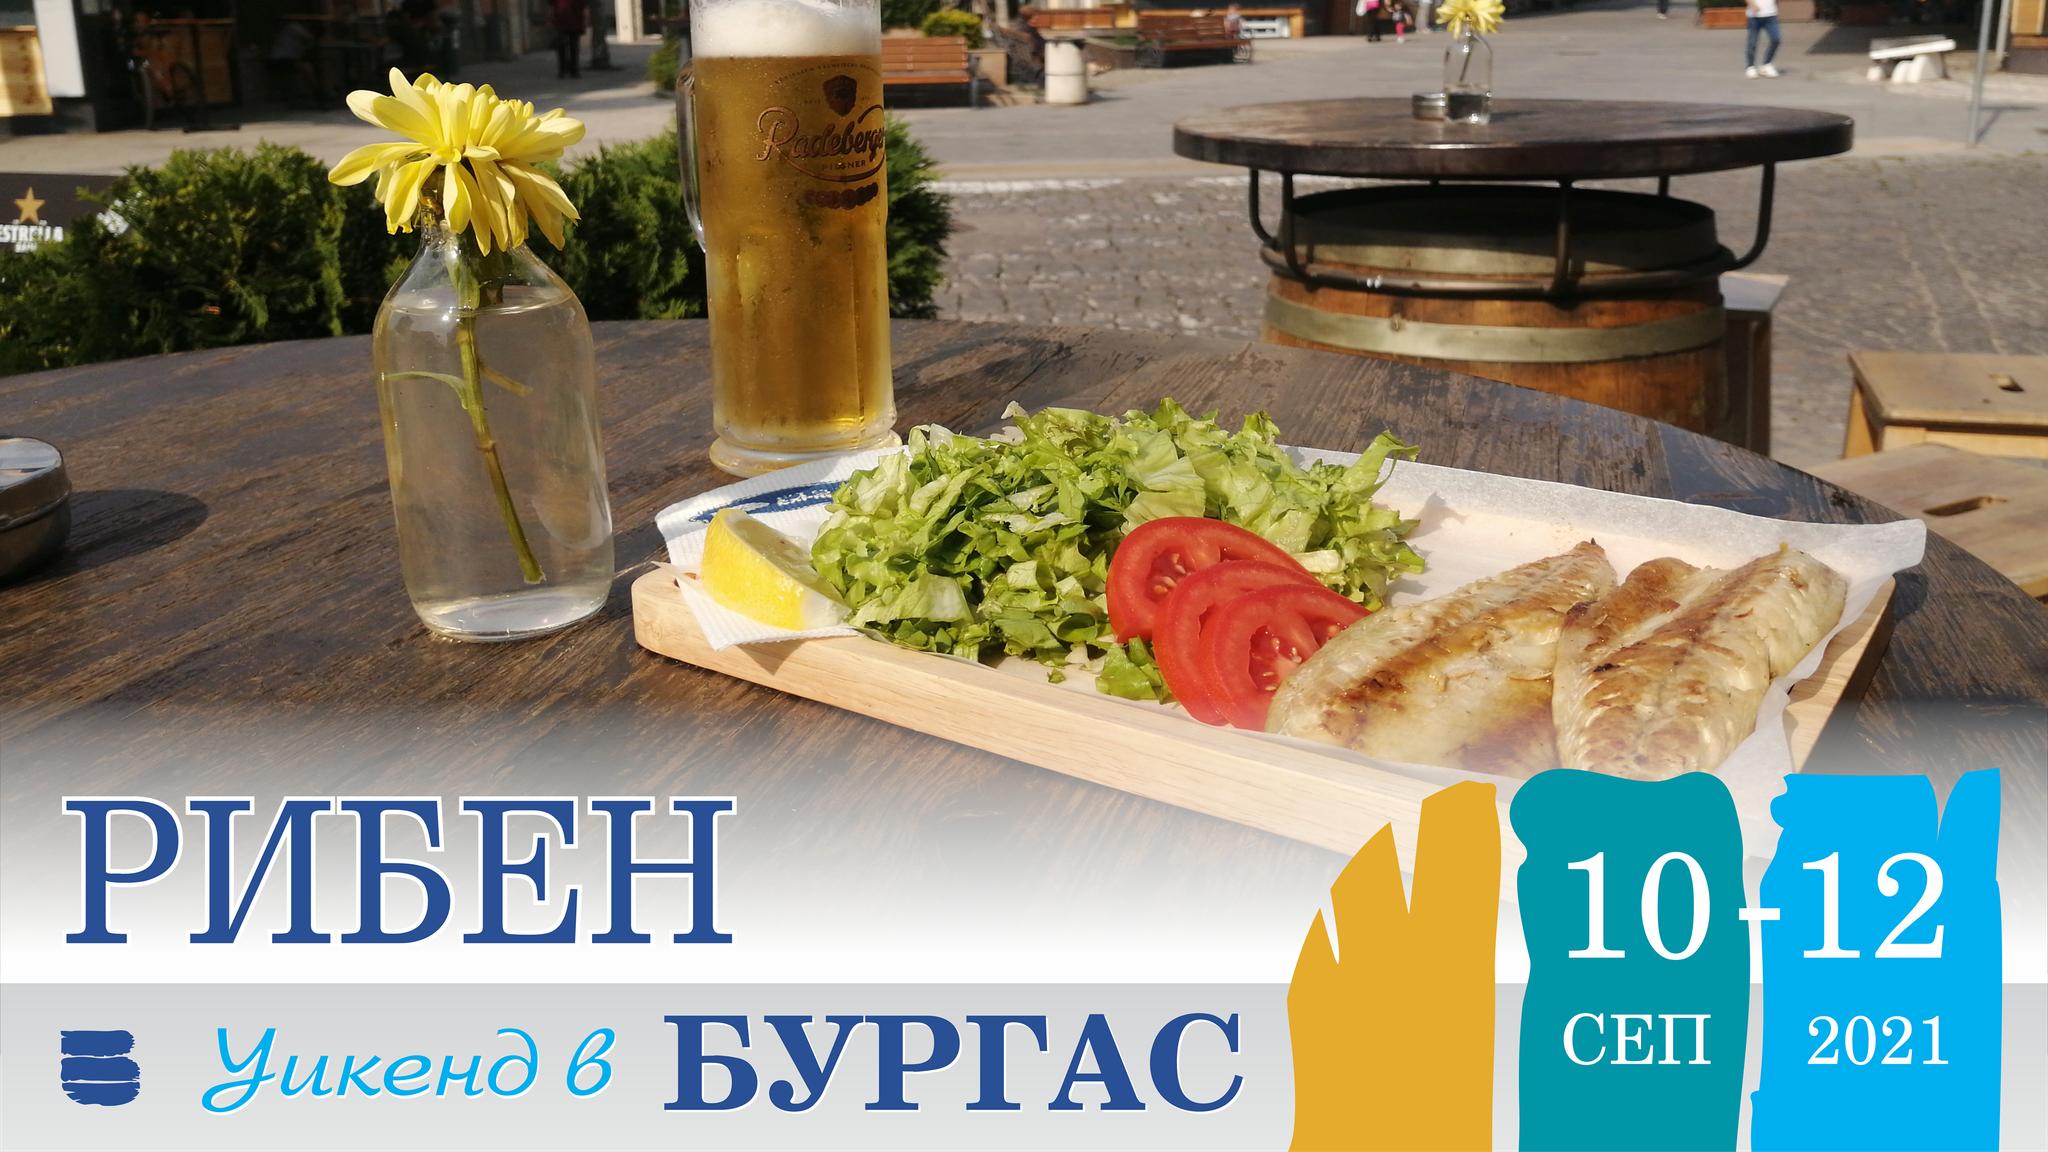 Рибен уикенд в Бургас 10 - 12 септември